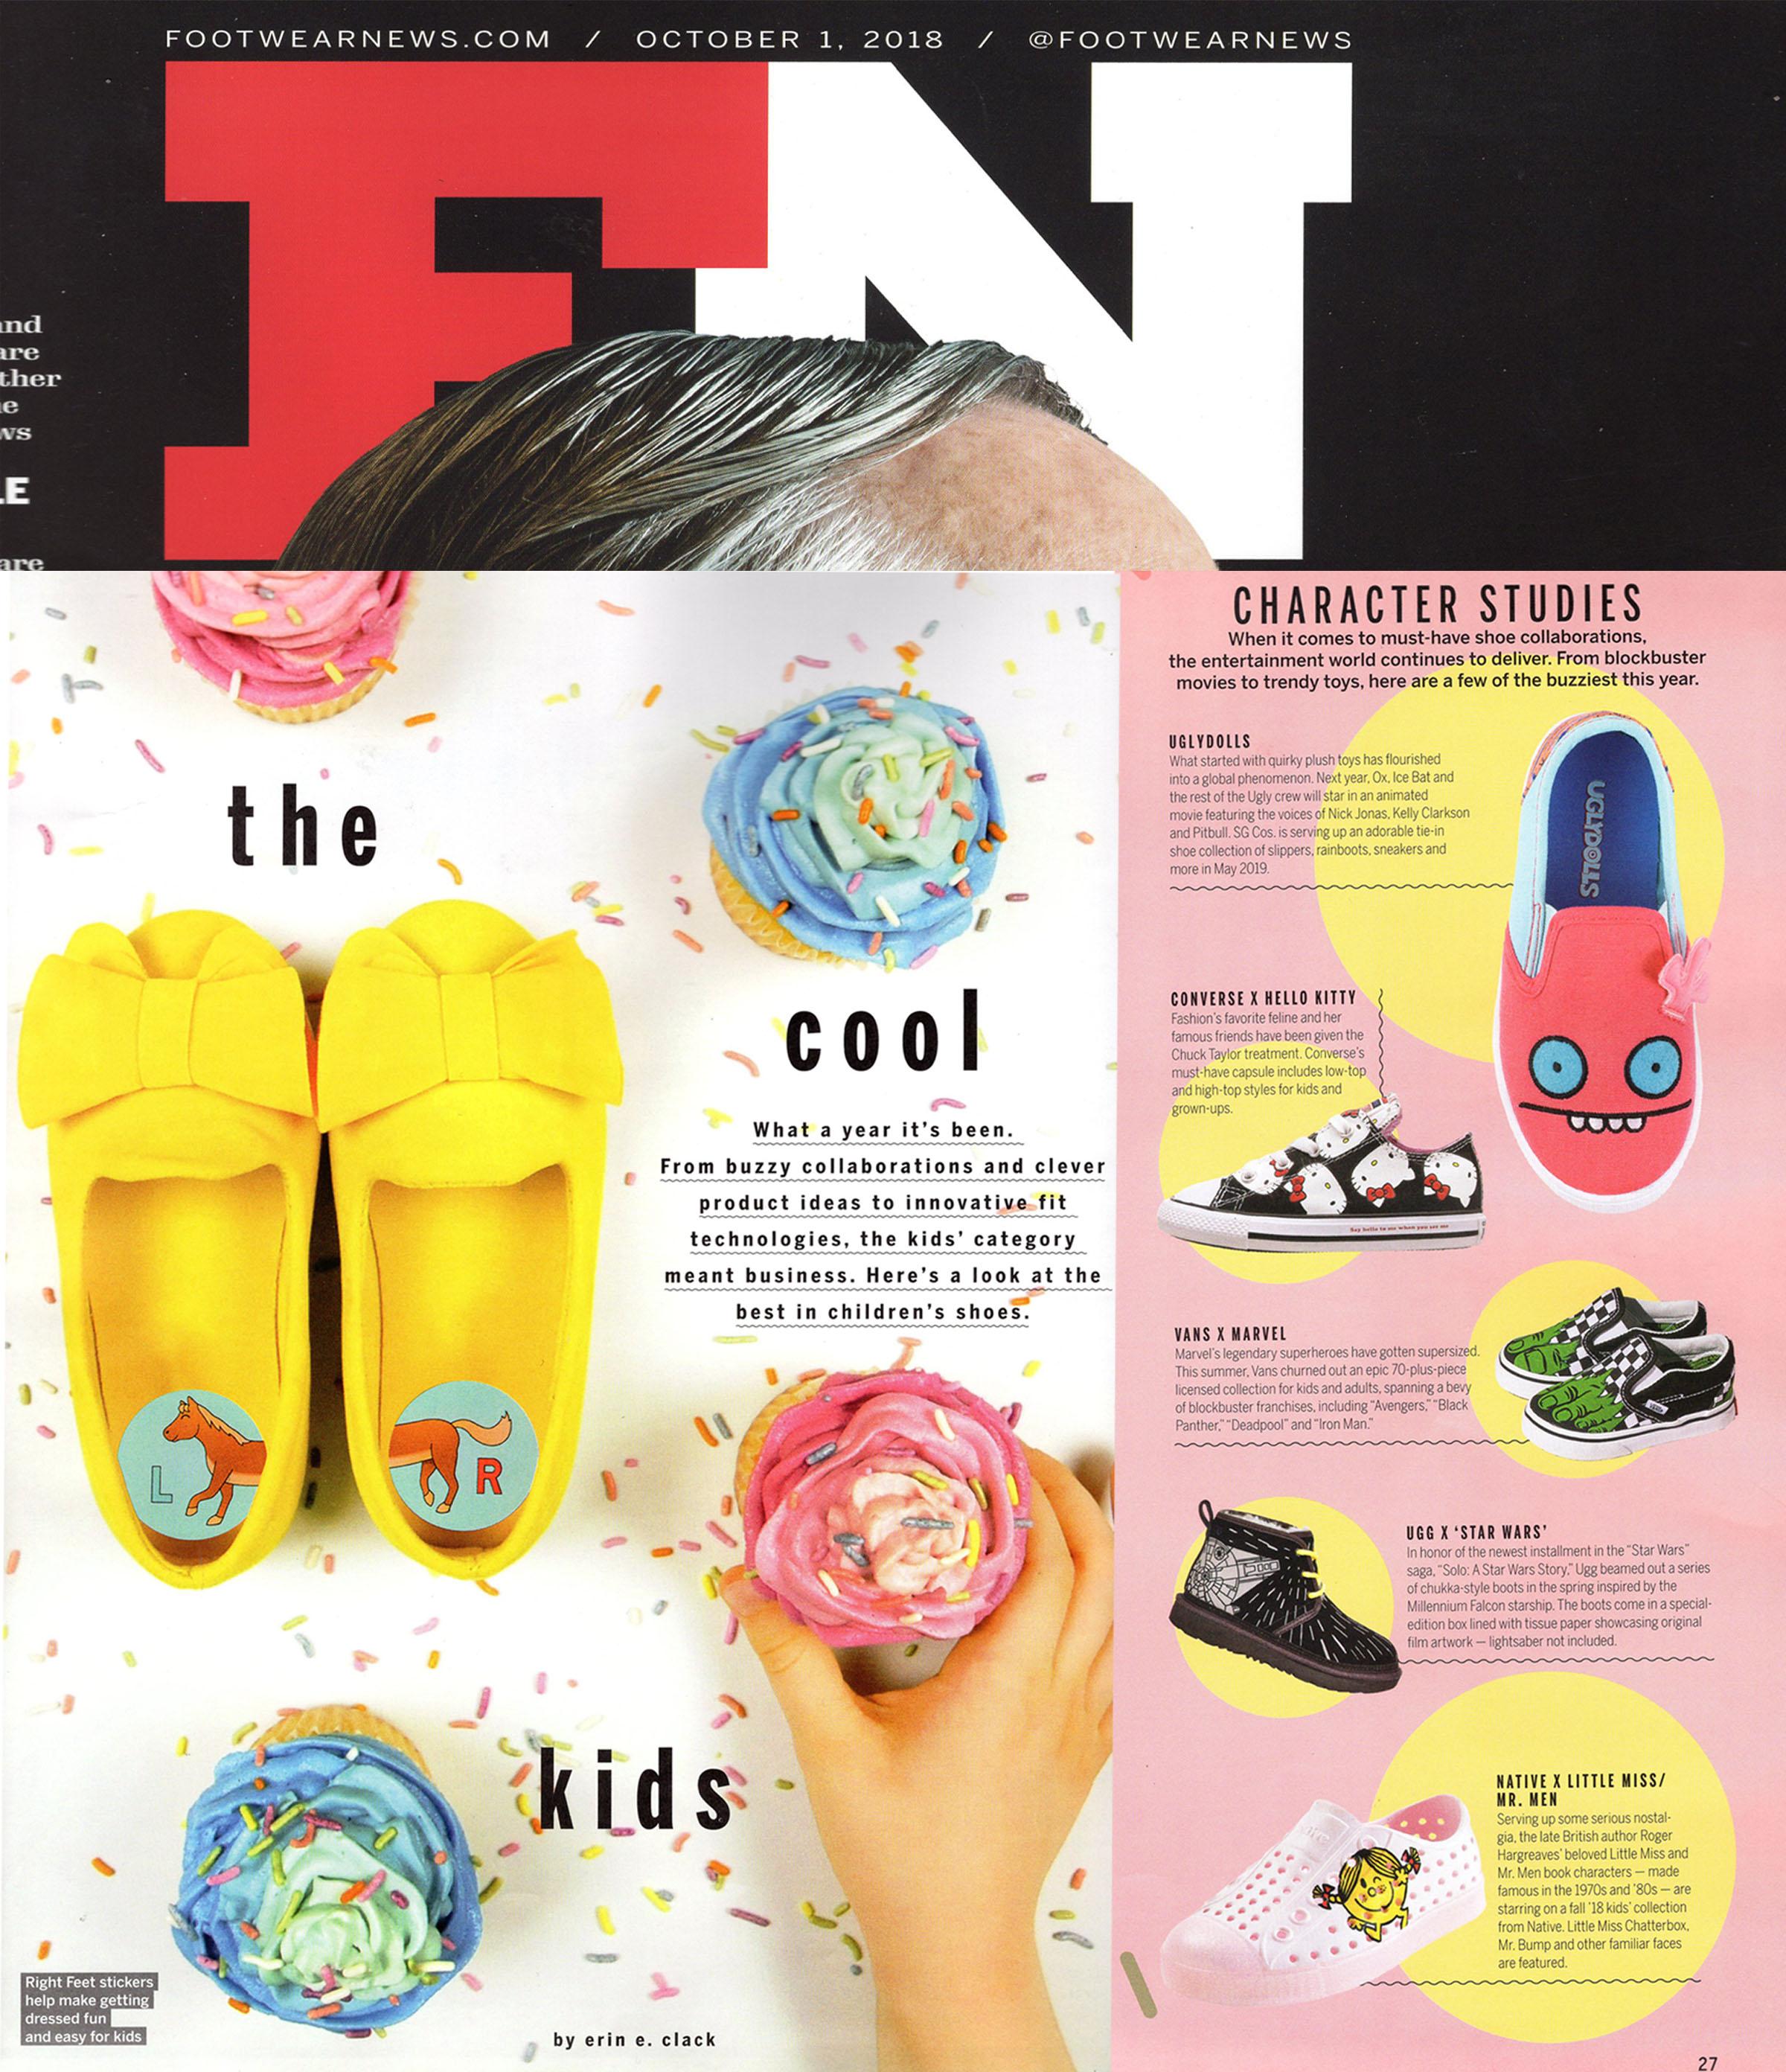 Footwear News - October 1 - Hello Kitty